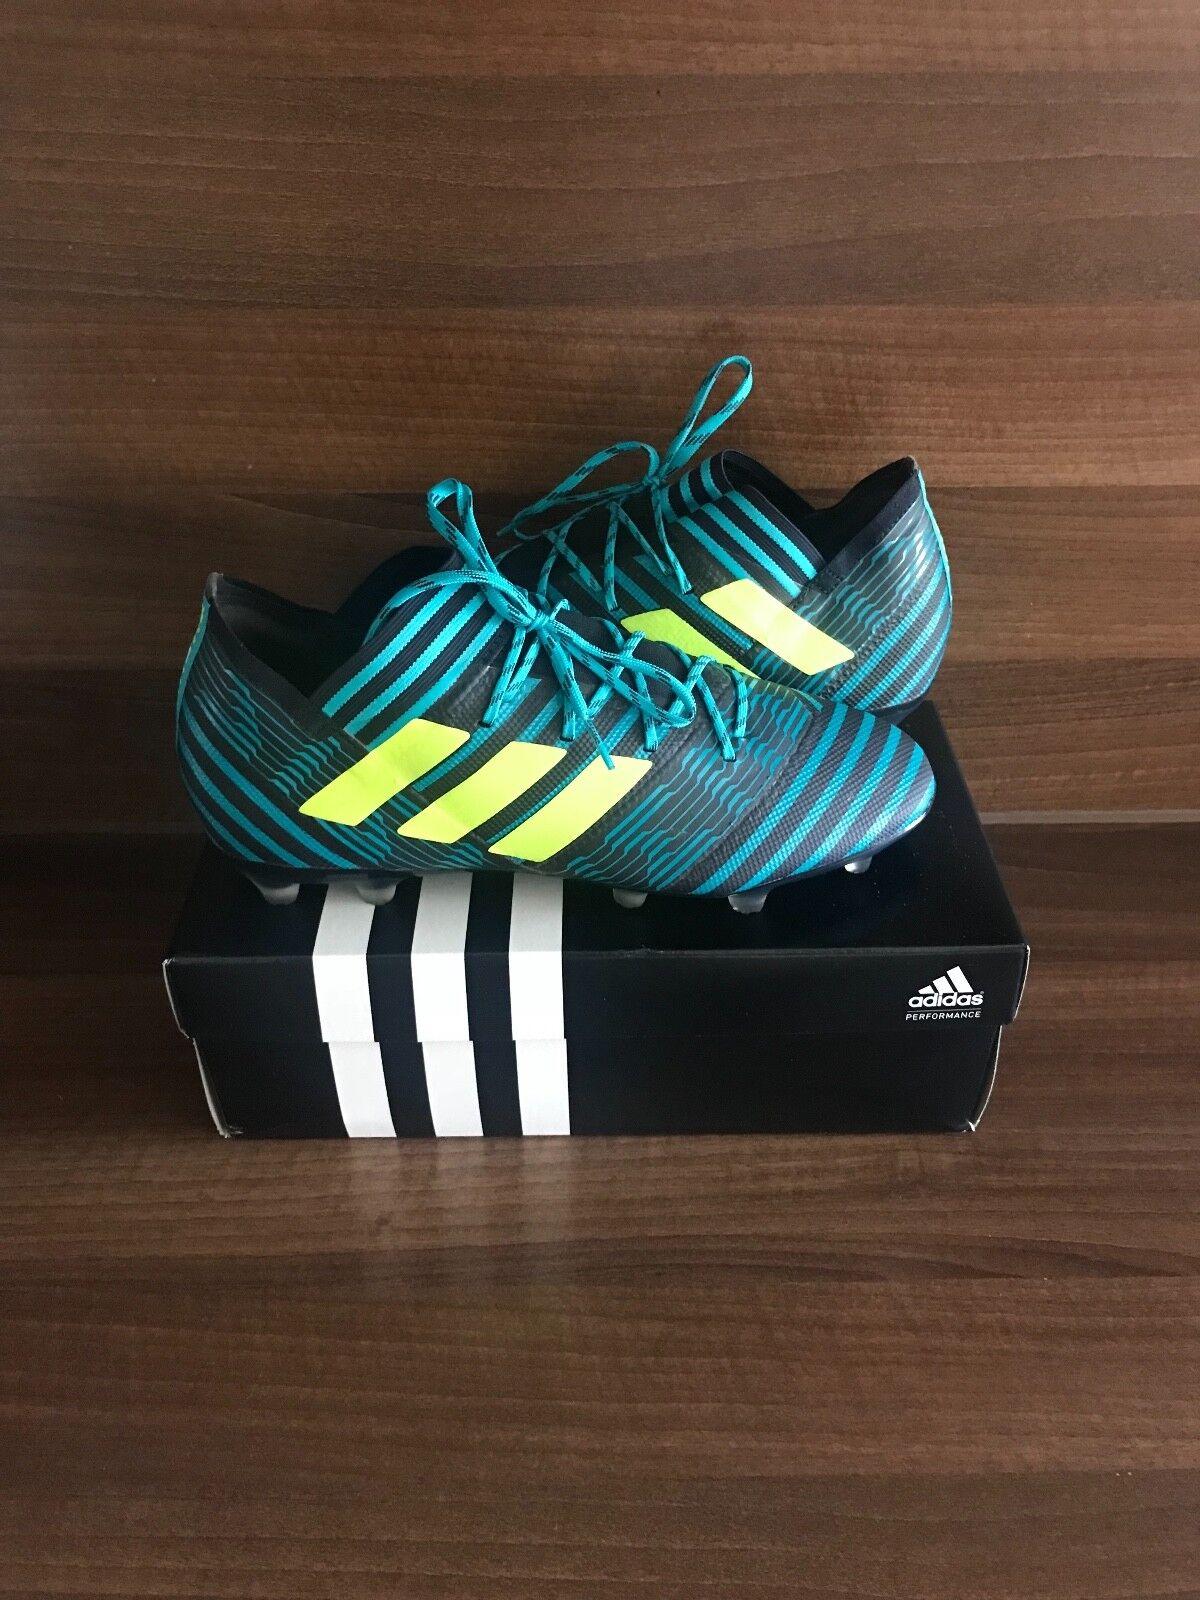 Top Blau Originals Dunkel Low Qualität Sneaker Zx 750 Adidas